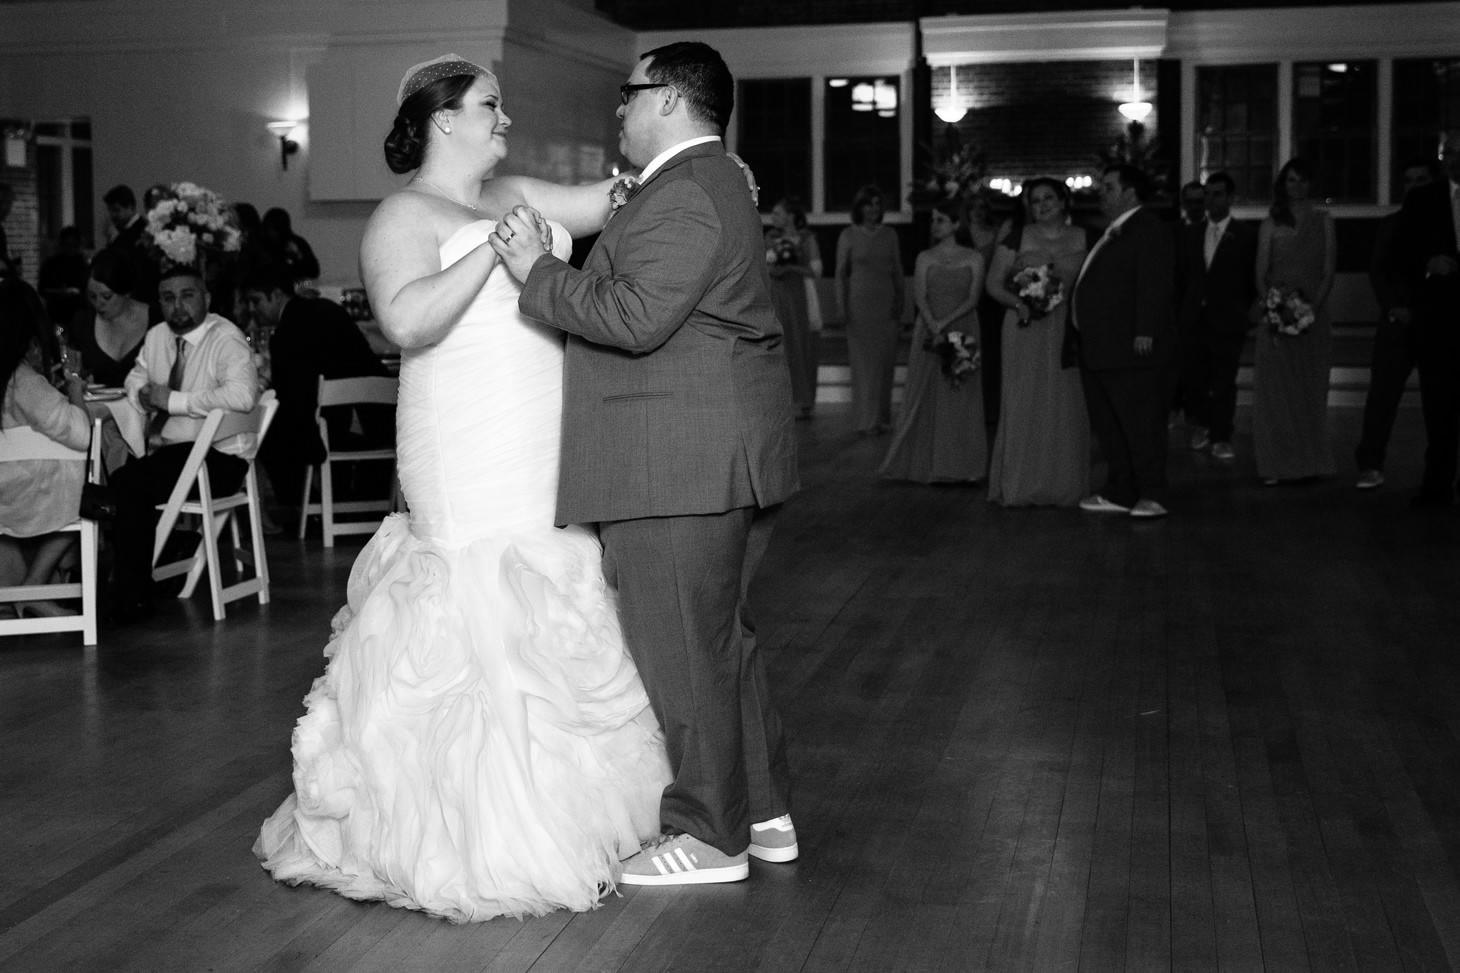 nyc-brooklyn-prospect-park-picnic-house-wedding-smitten-chickens-nerdy-44.jpg